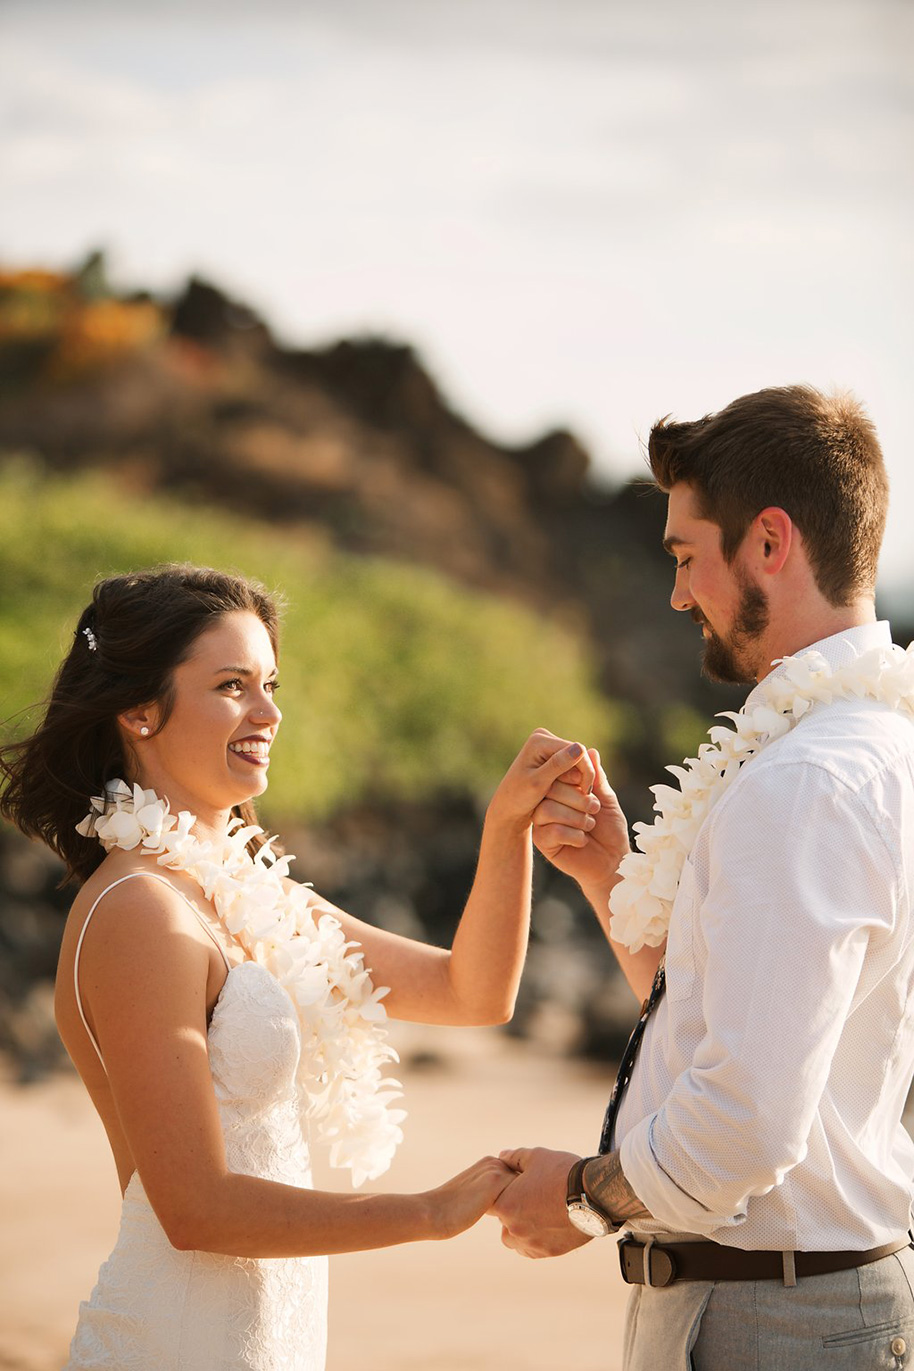 Maui-Beach-Wedding-070616-12